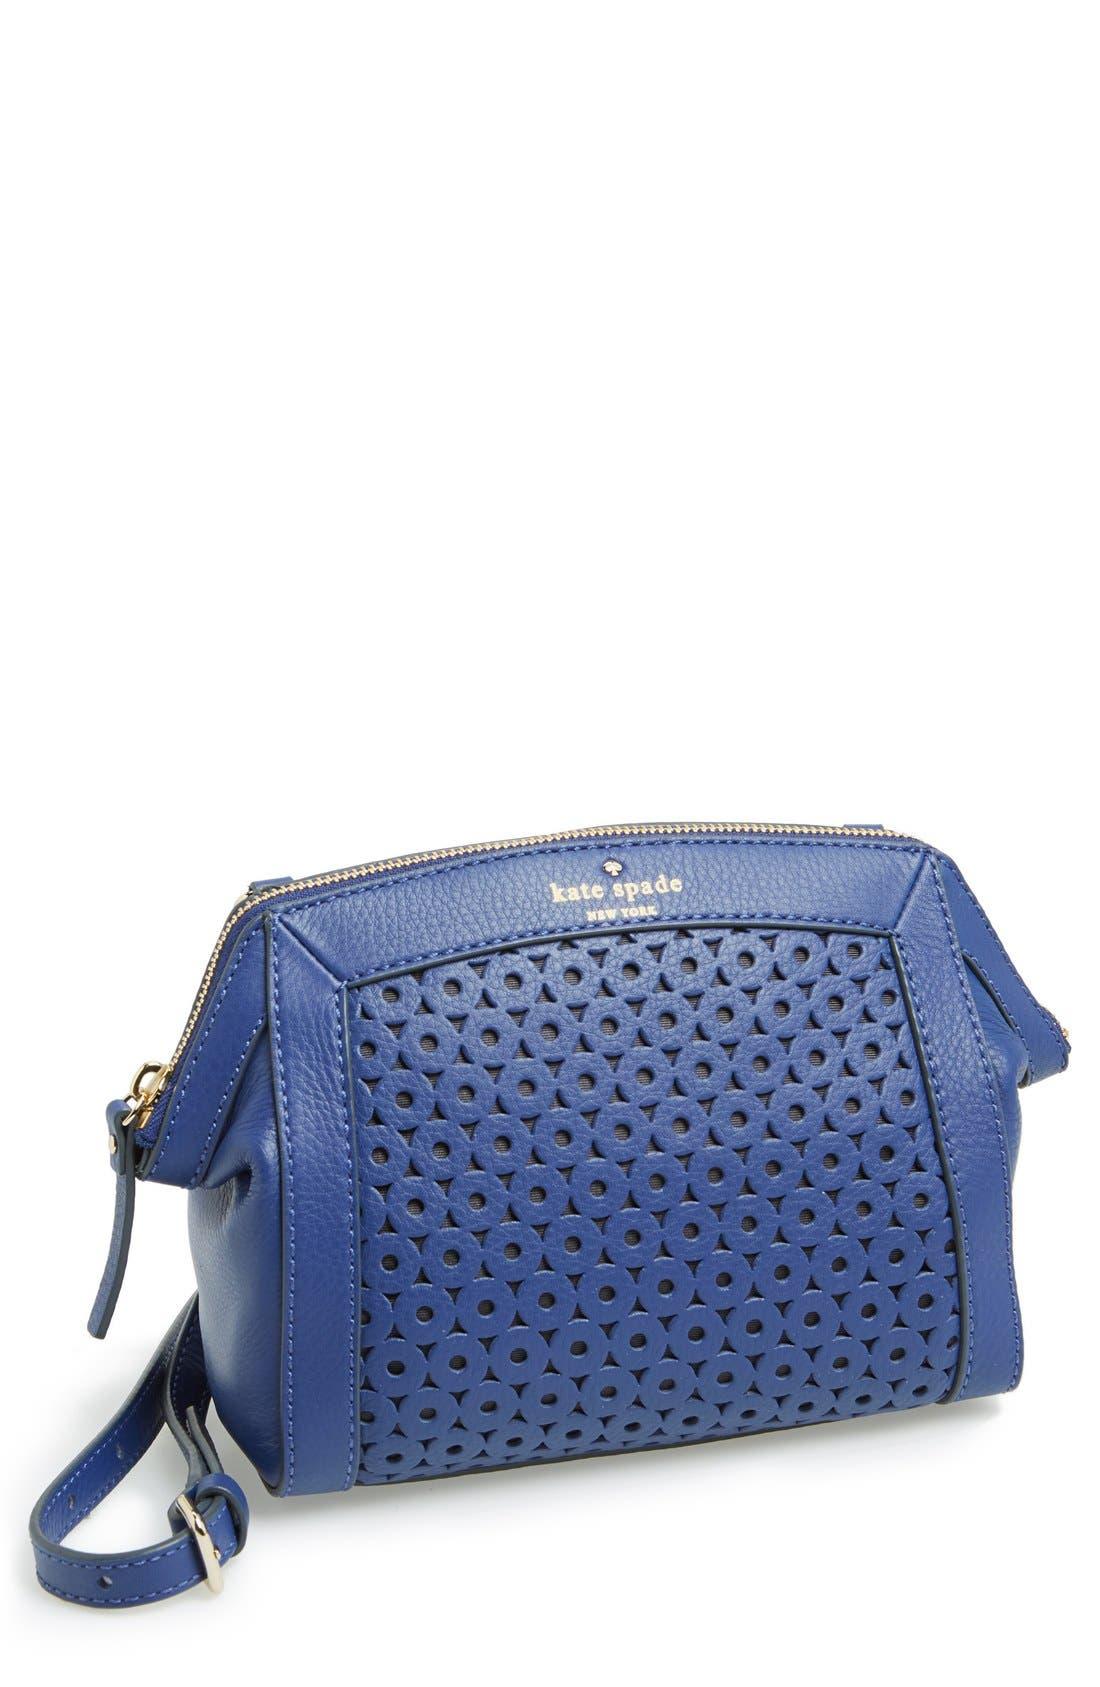 Main Image - kate spade new york 'mercer isle - sienna' crossbody bag